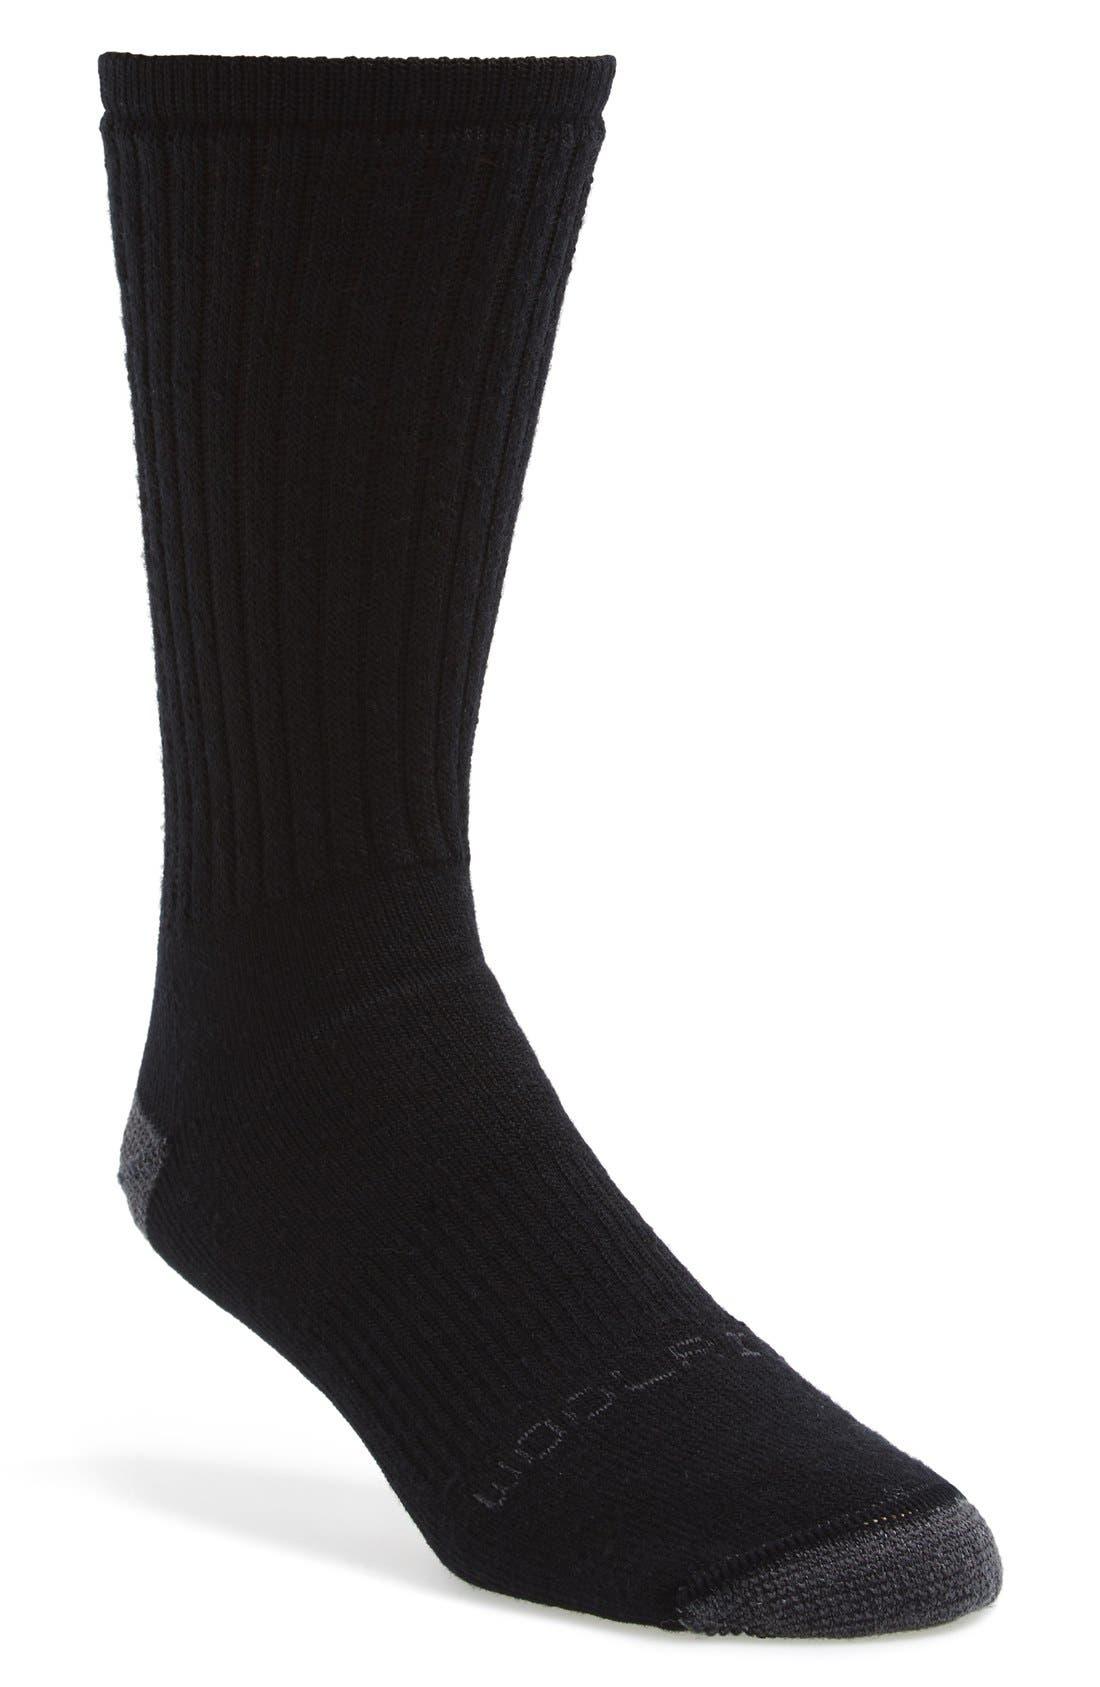 'Ten Mile Hiker' Merino Wool Blend Crew Socks,                             Main thumbnail 1, color,                             001